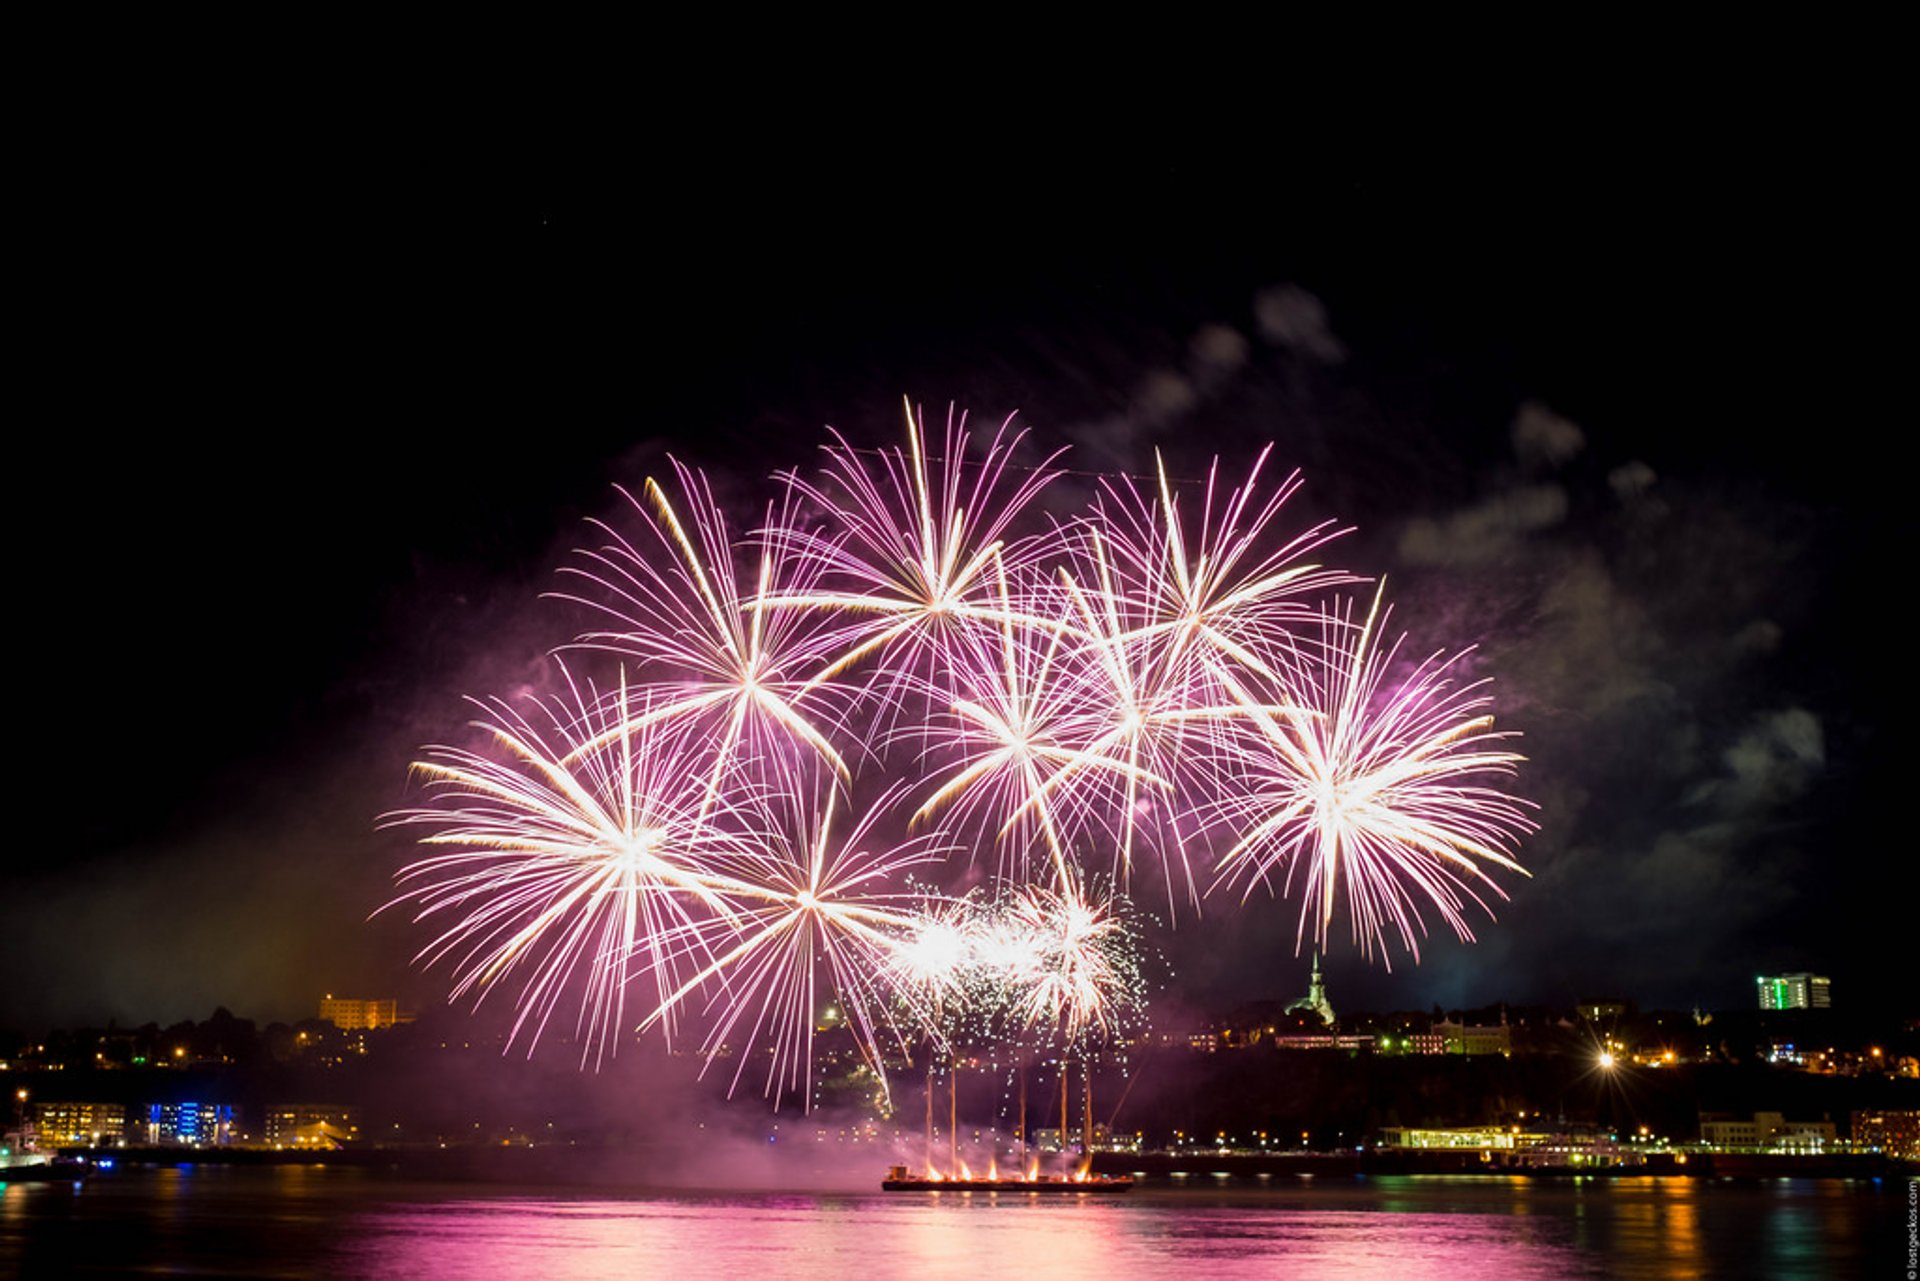 Best time to see Les Grands Feux Loto-Québec (Fireworks Festival) in Quebec 2020